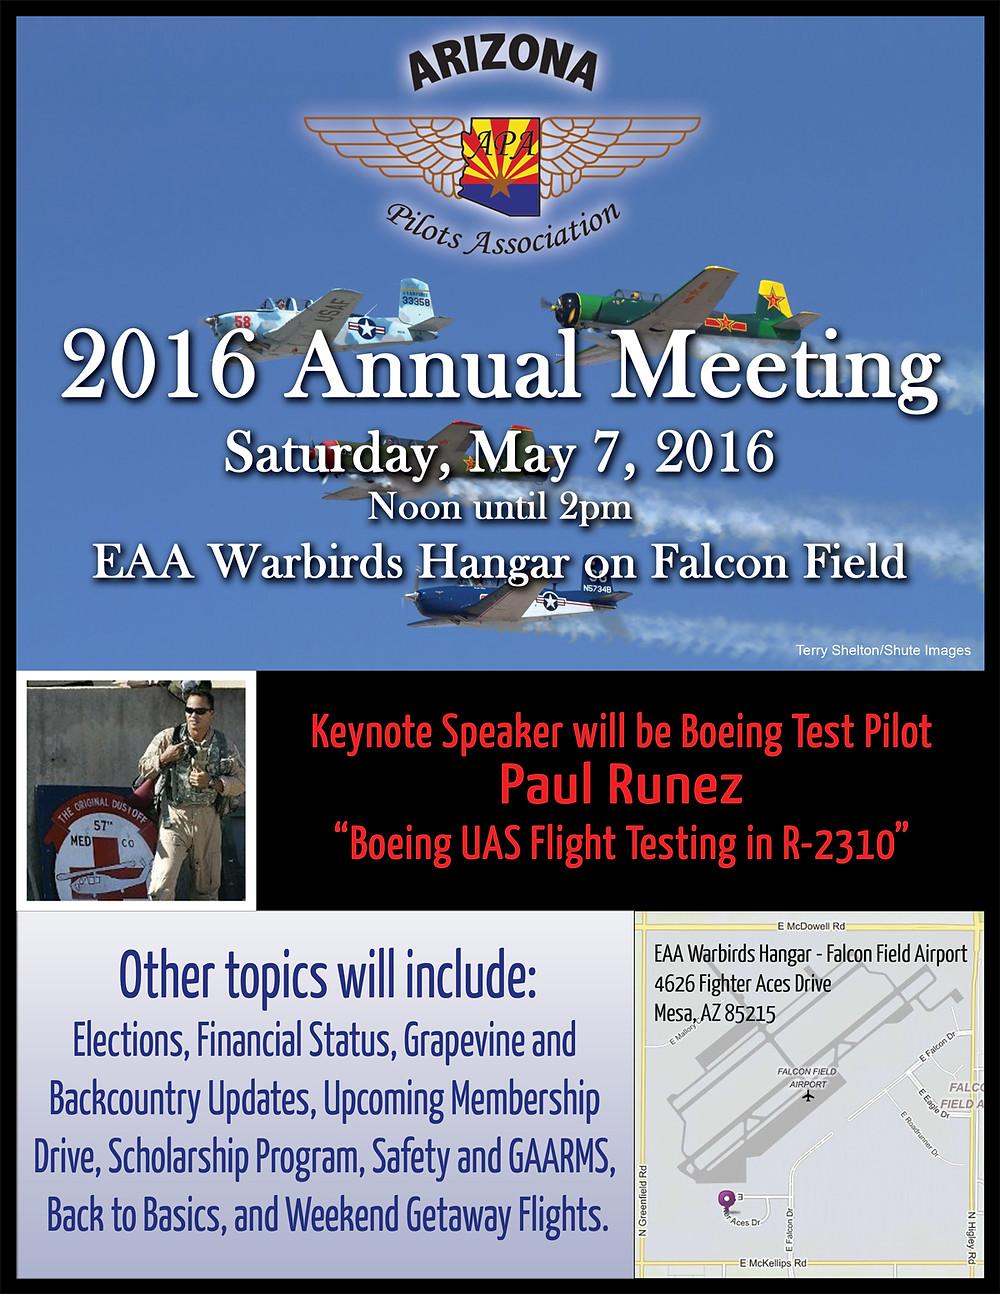 arizona pilots association 2016 annual meeting